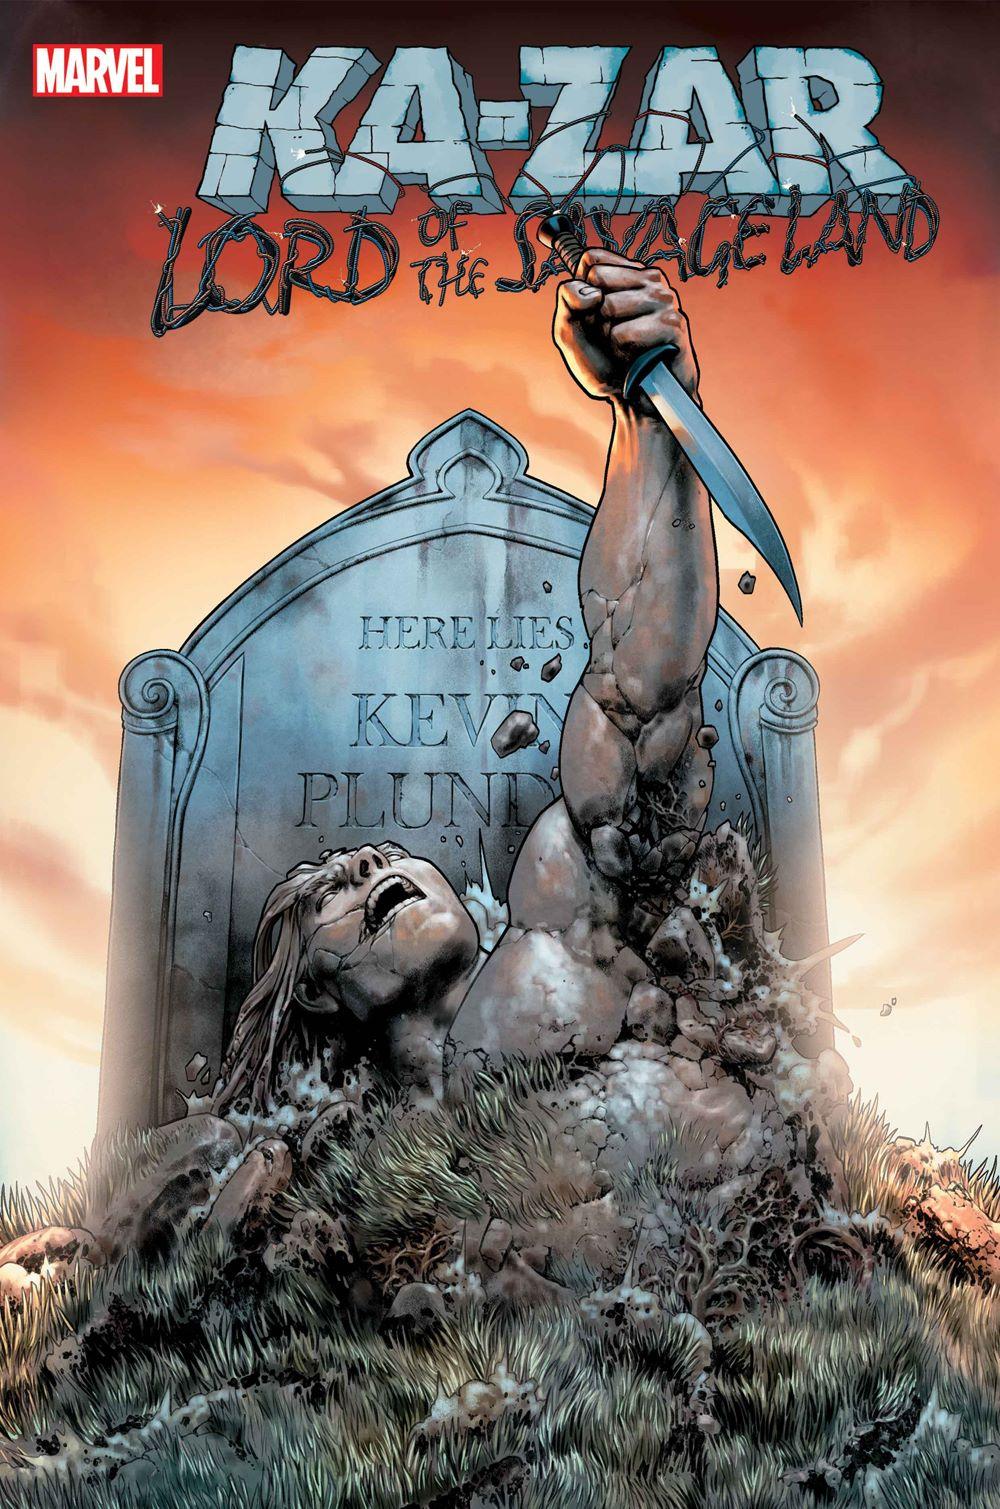 KAZARLORDSAVLAND2021001_COV First Look at KA-ZAR: LORD OF THE SAVAGE LAND #1 from Marvel Comics